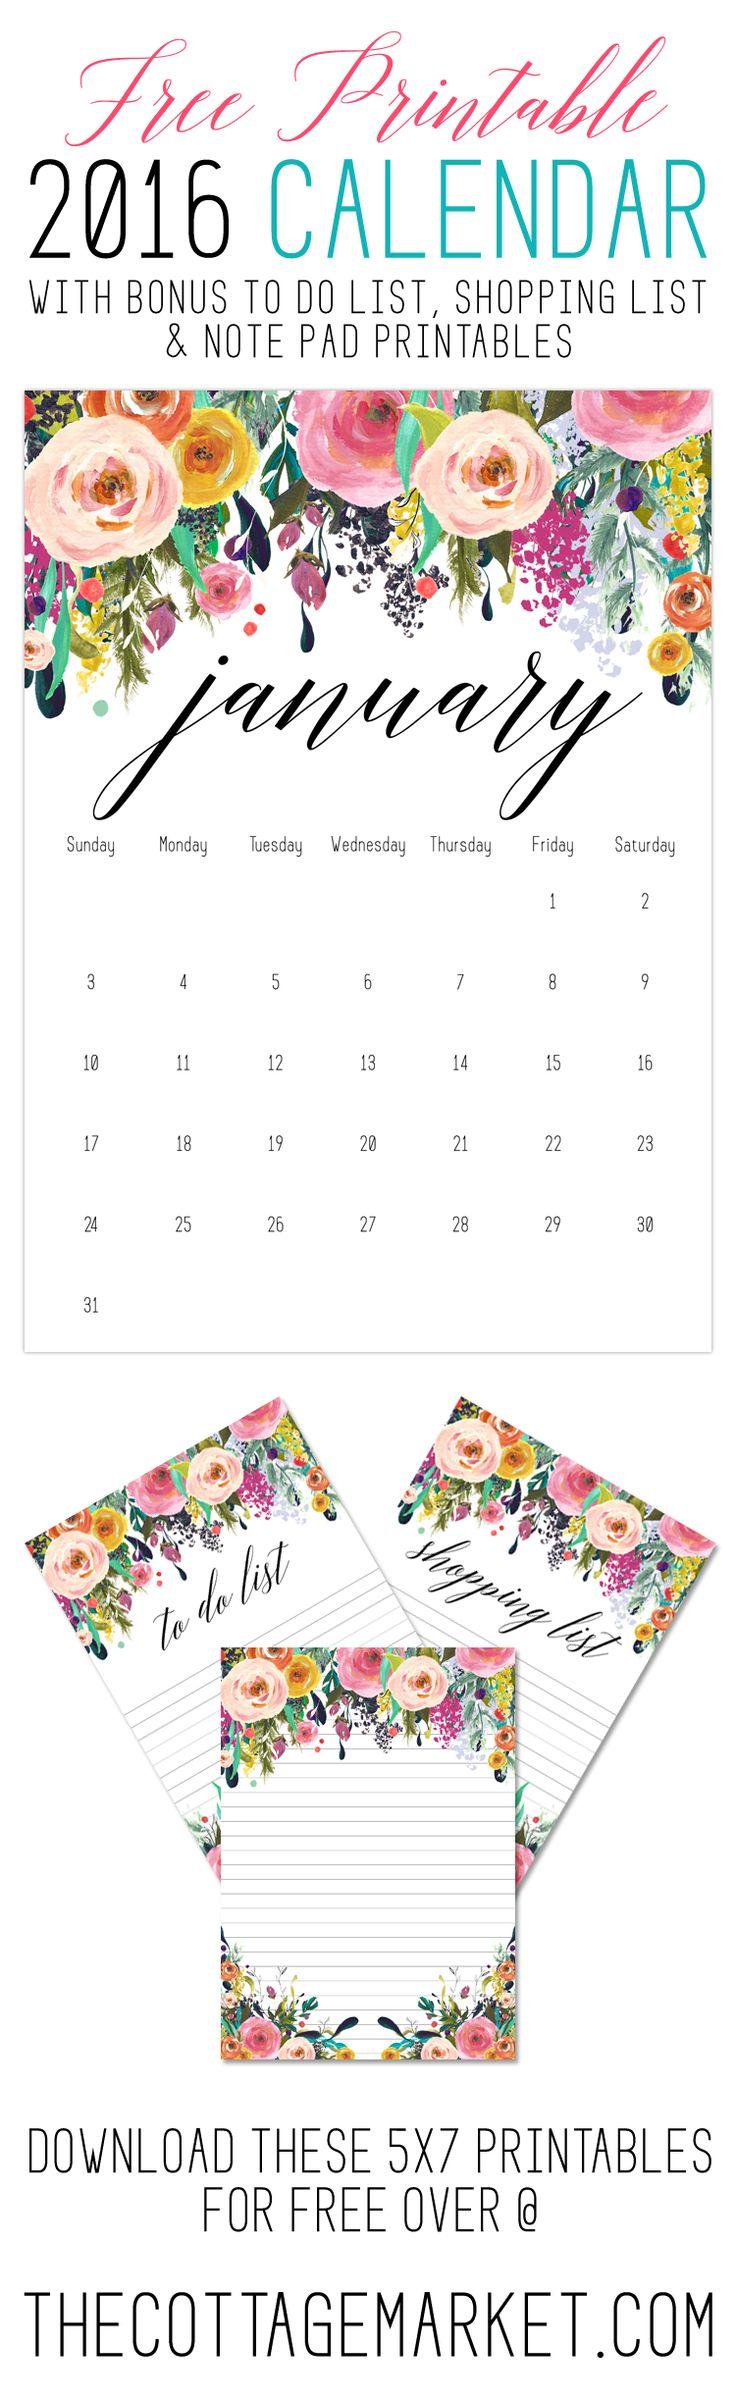 Free Printable 2016 Calendar /// with Bonus Free To Do List, Shopping List &…